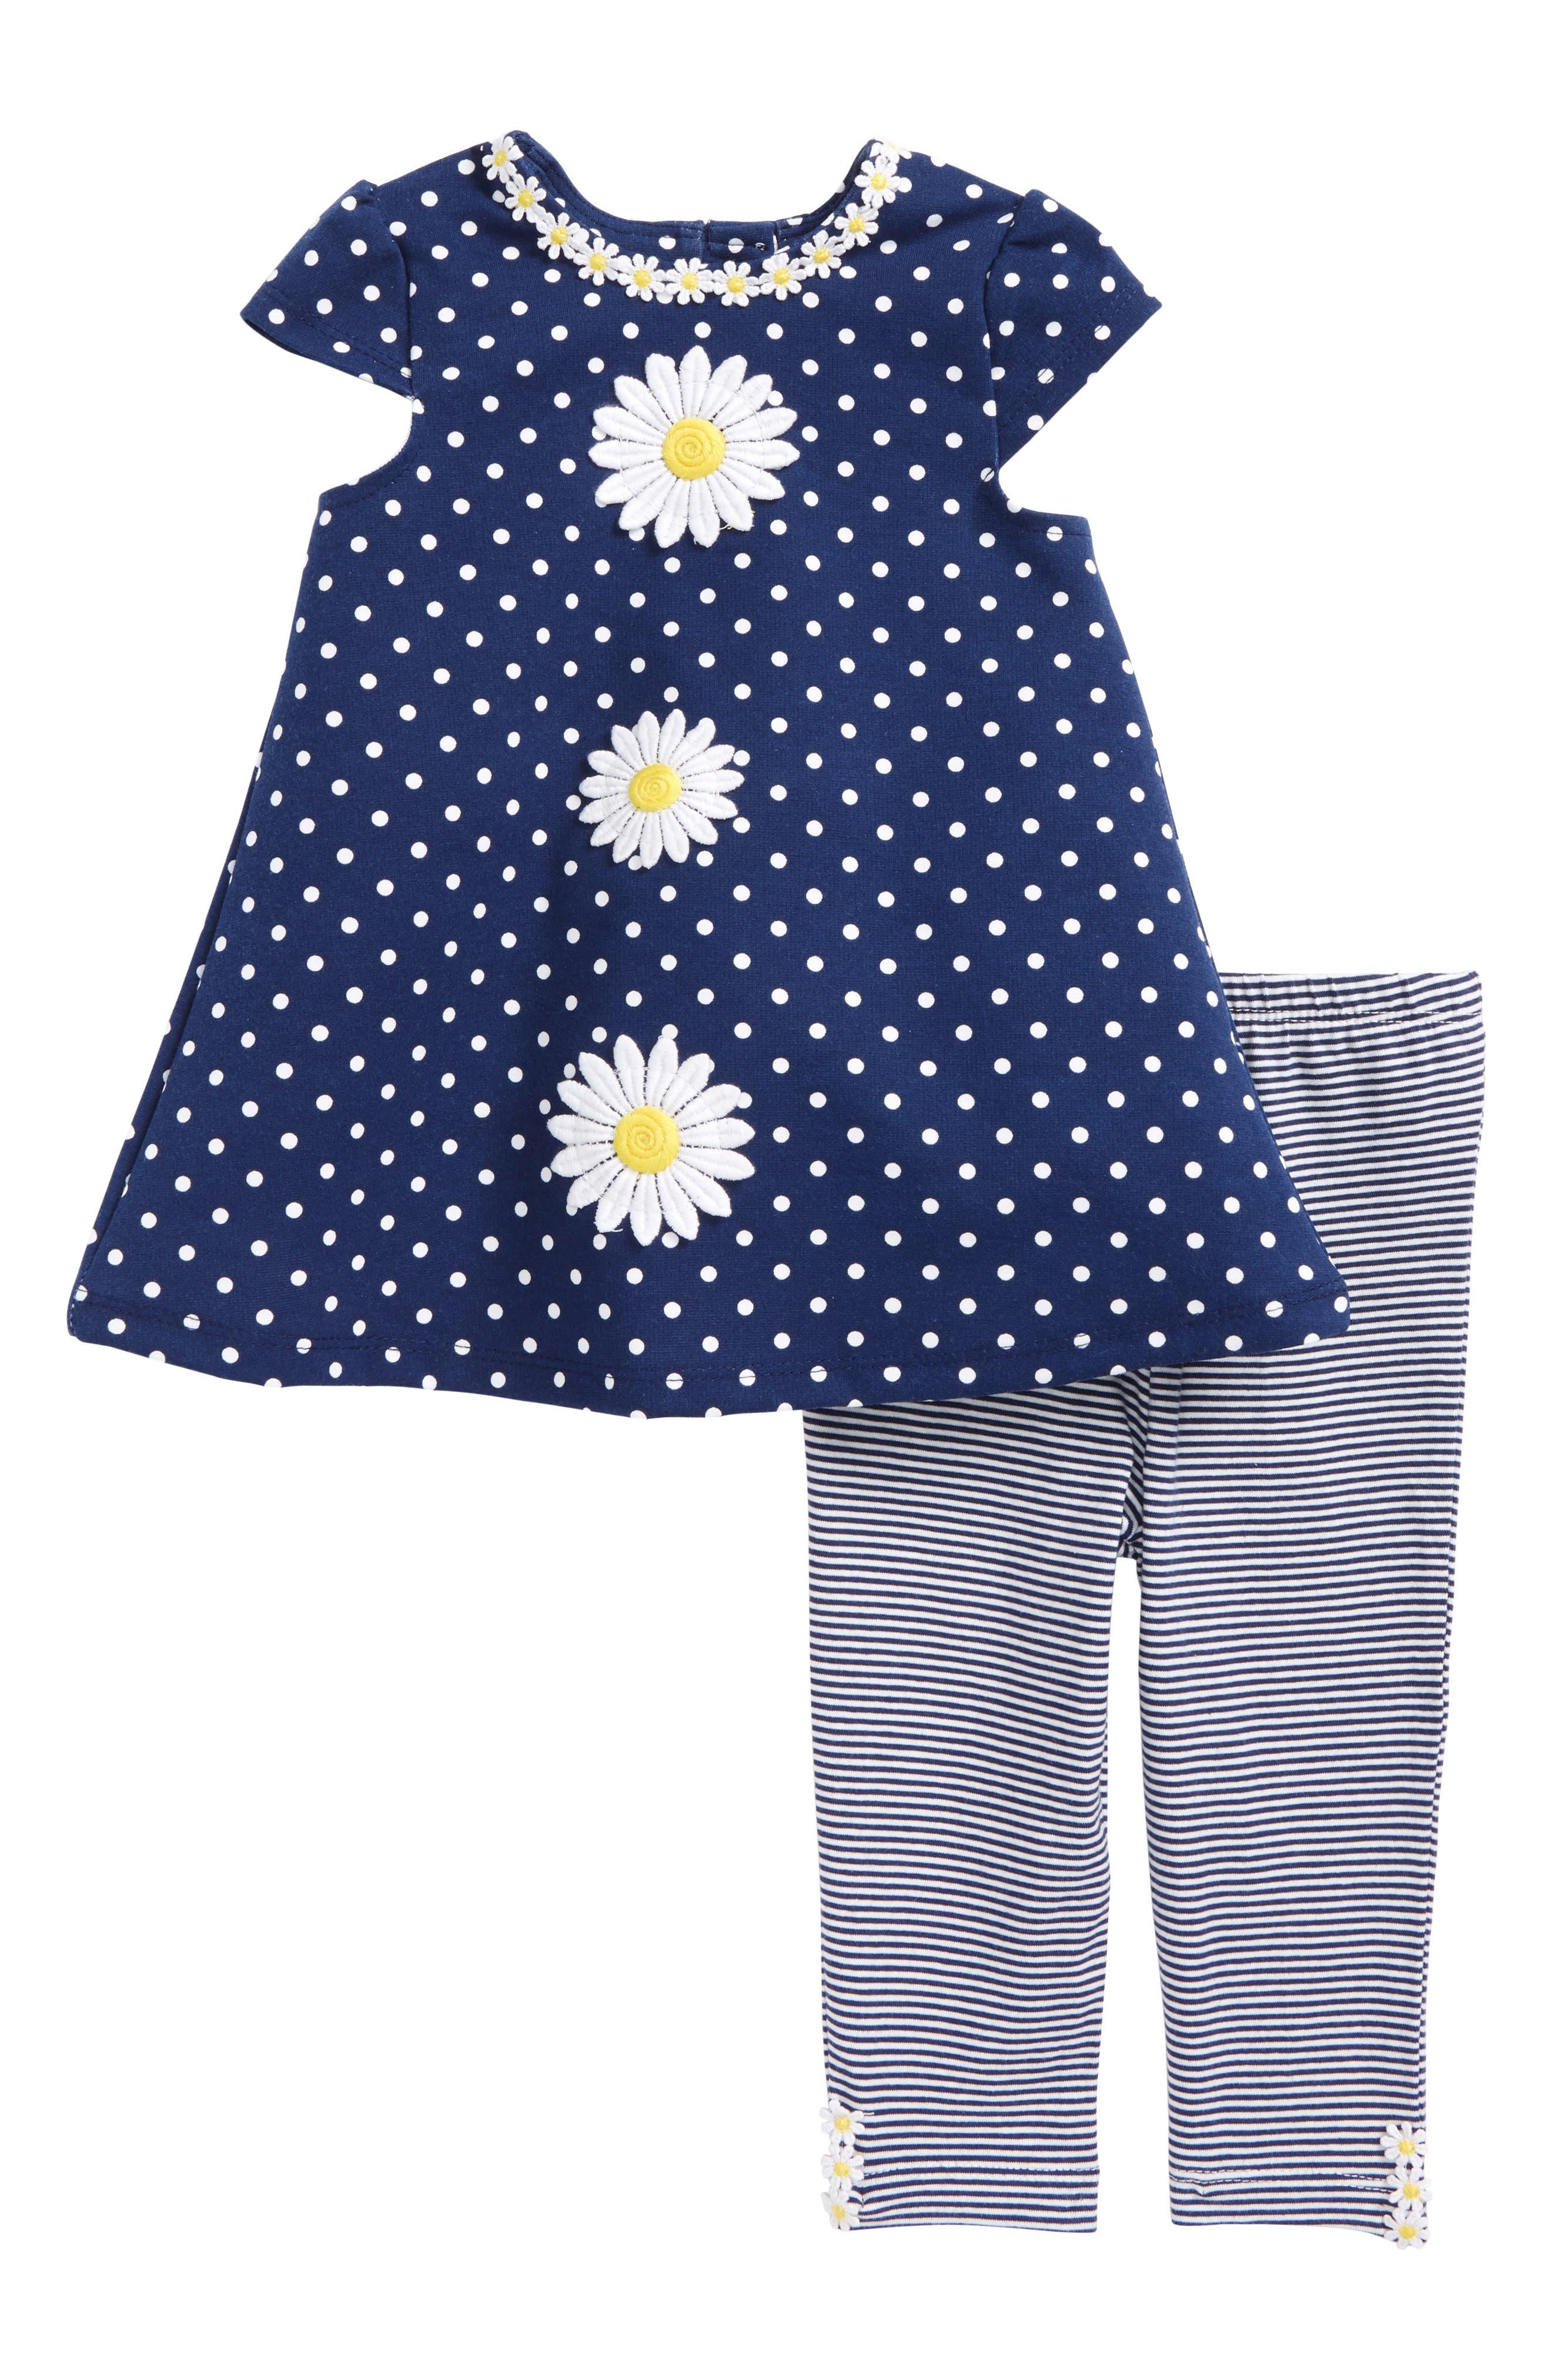 Daisy Polka Dot Dress & Stripe Leggings Set,                             Main thumbnail 1, color,                             Navy